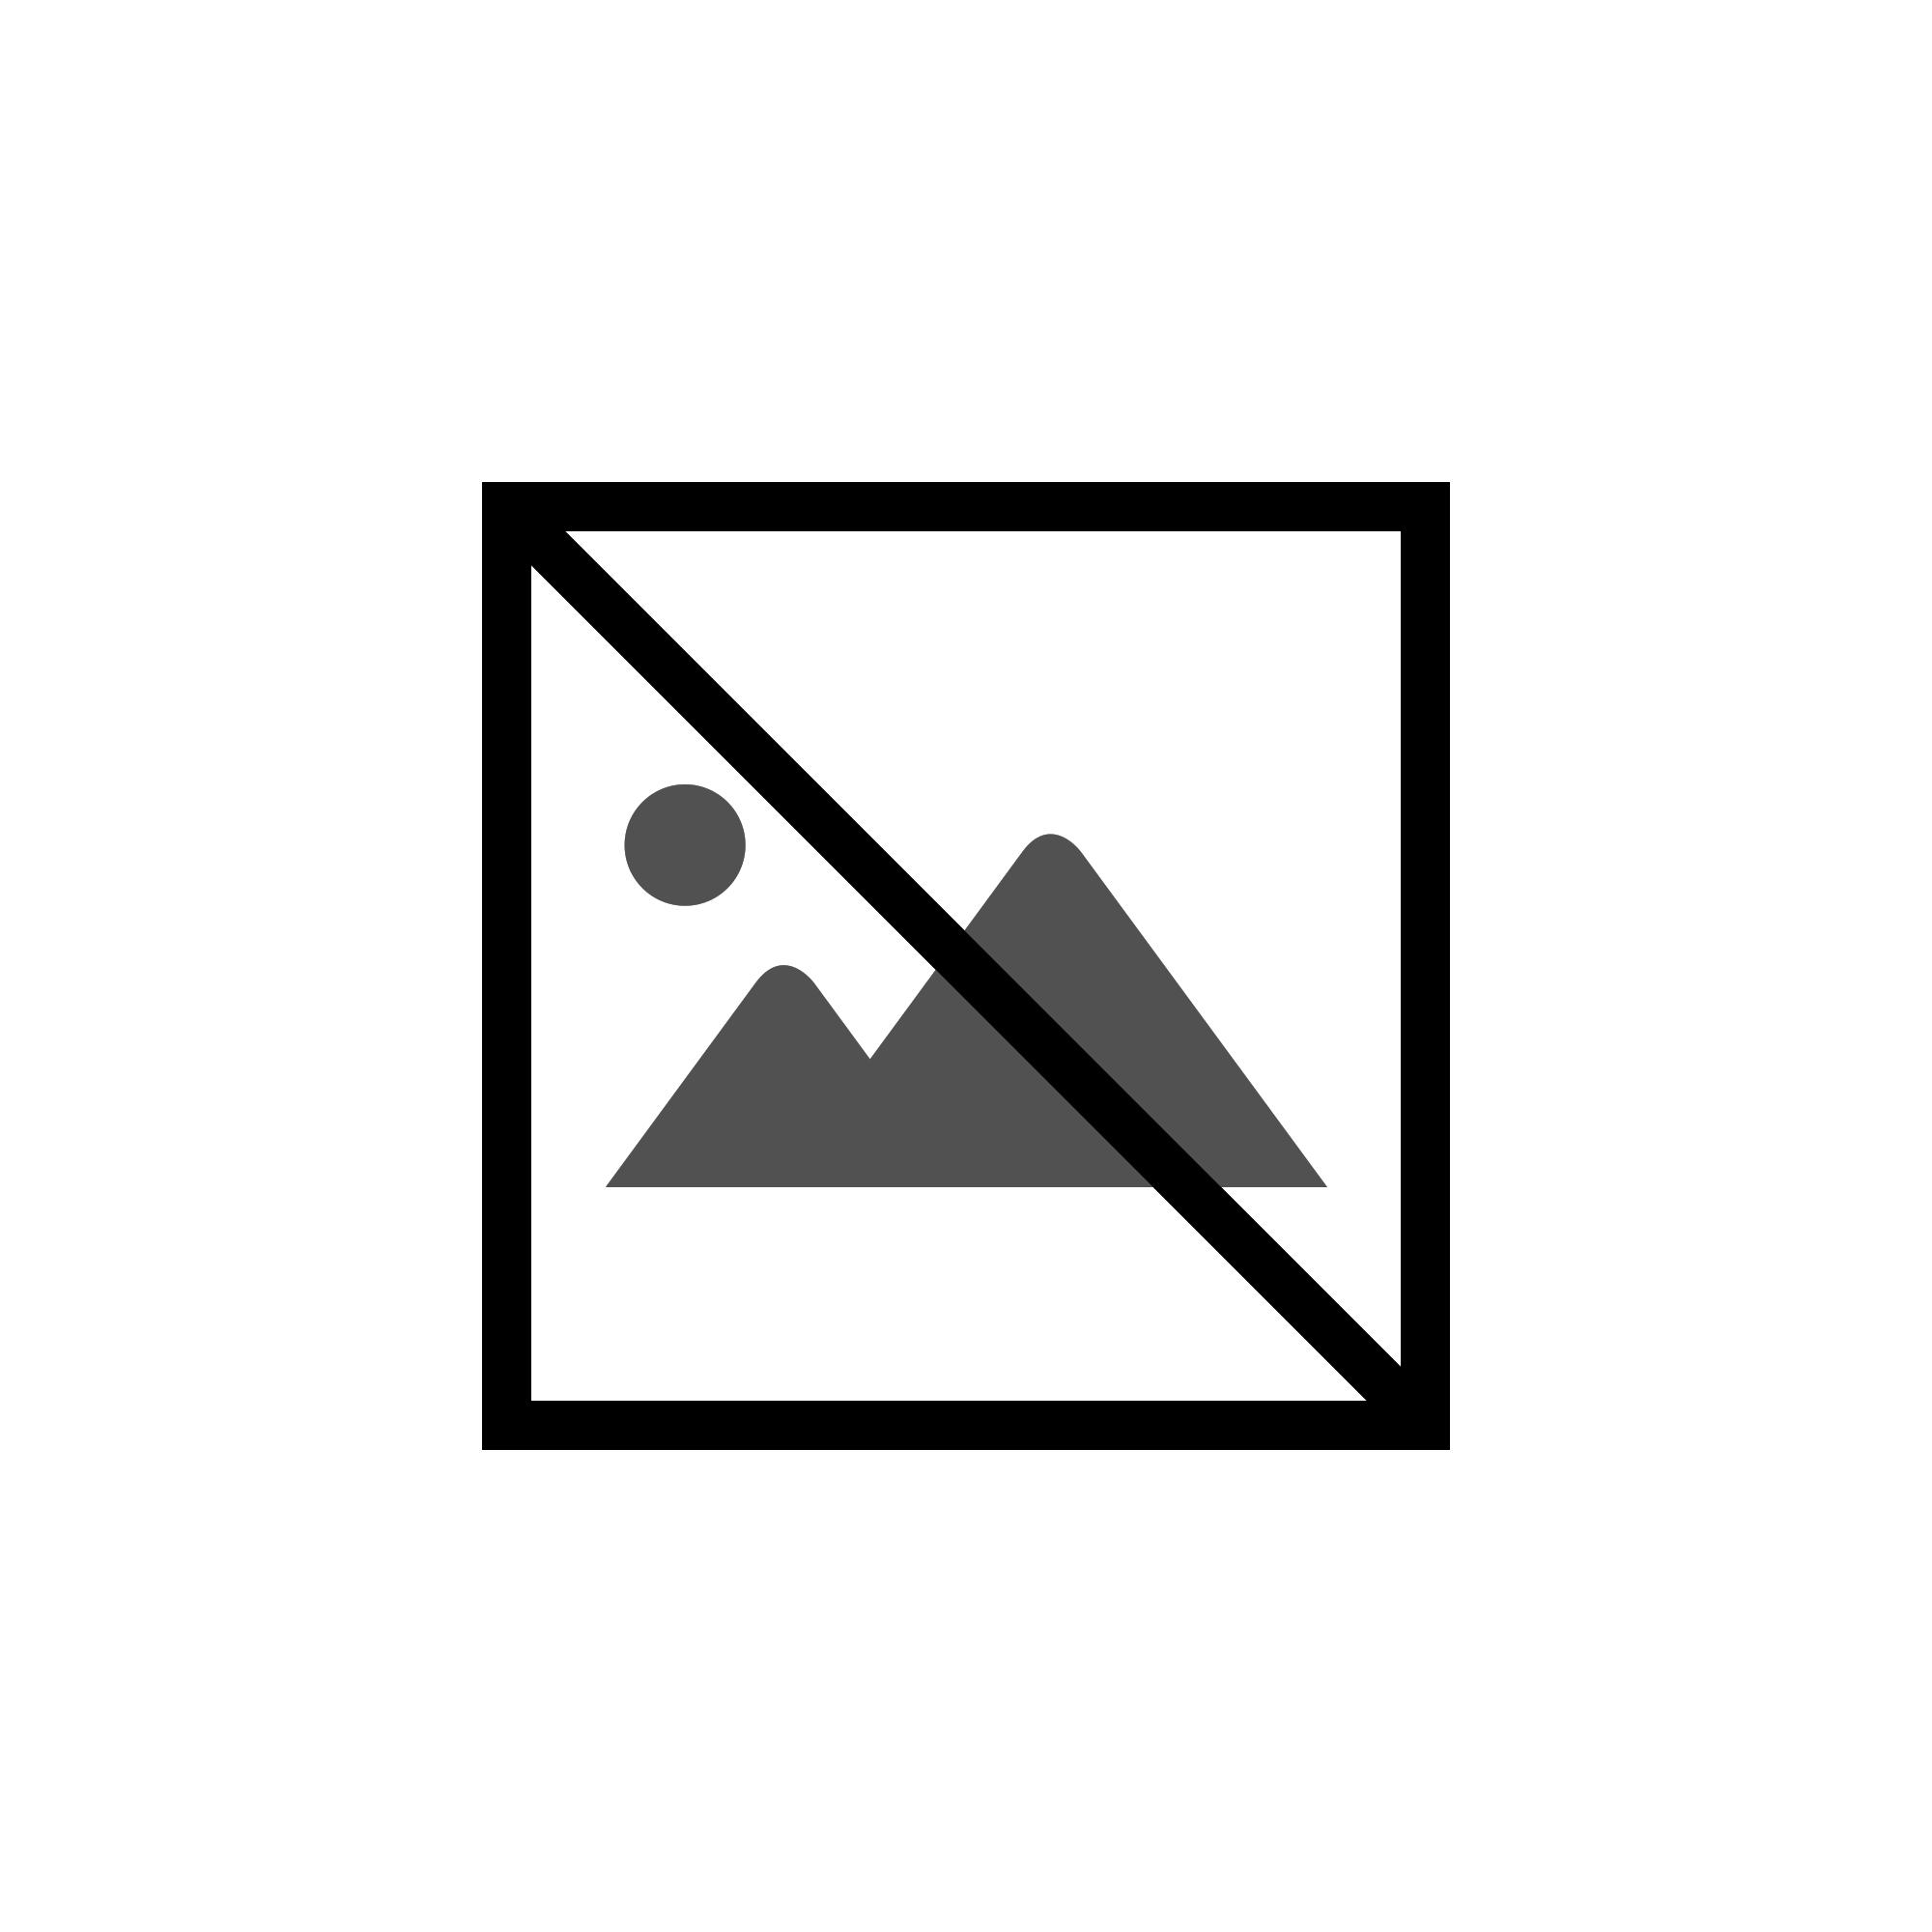 Olhanense, Golo, Cauê, 10m, 0-1